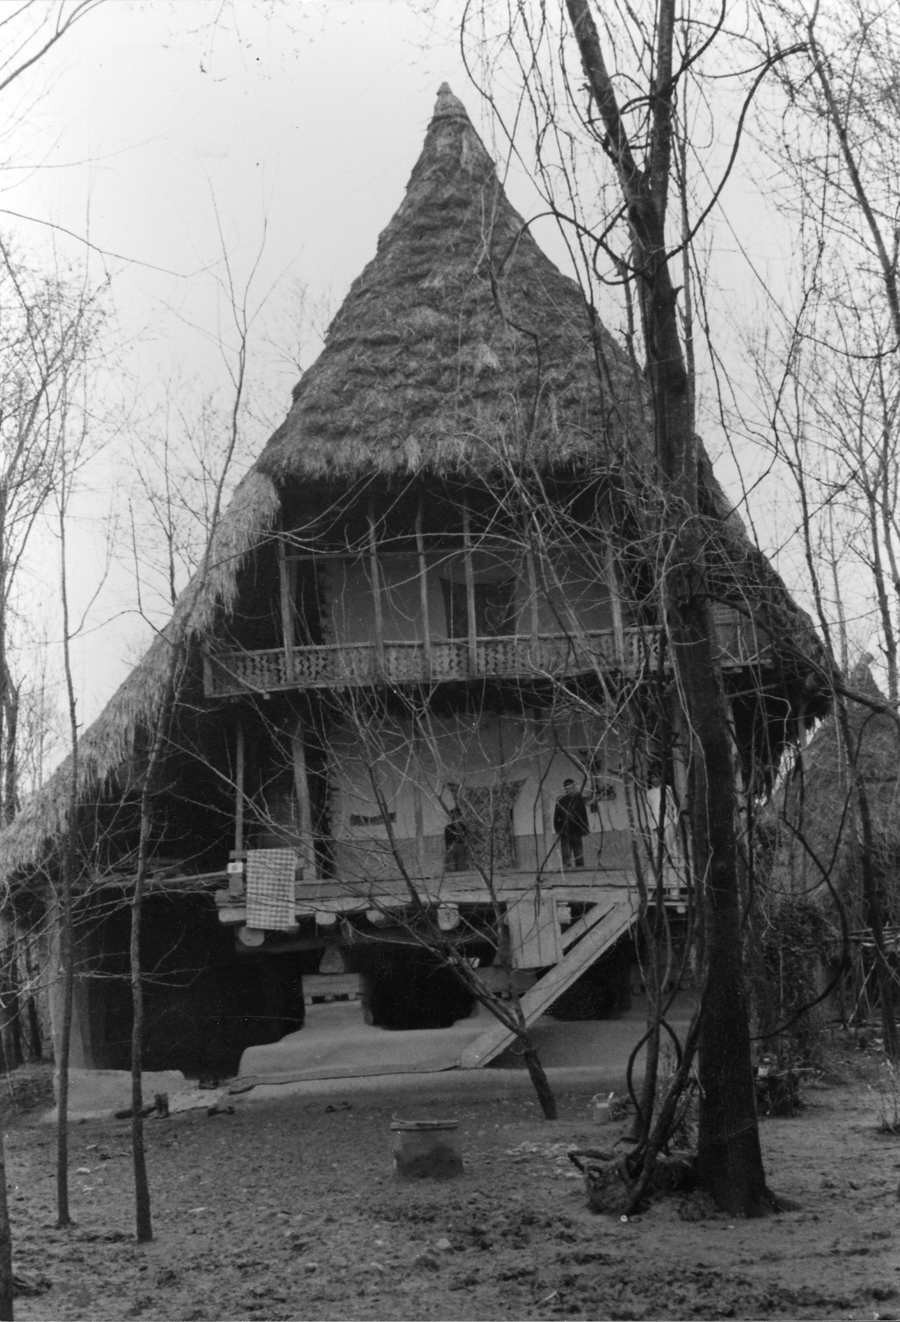 GilĀn Xii Rural Housing Encyclopaedia Iranica